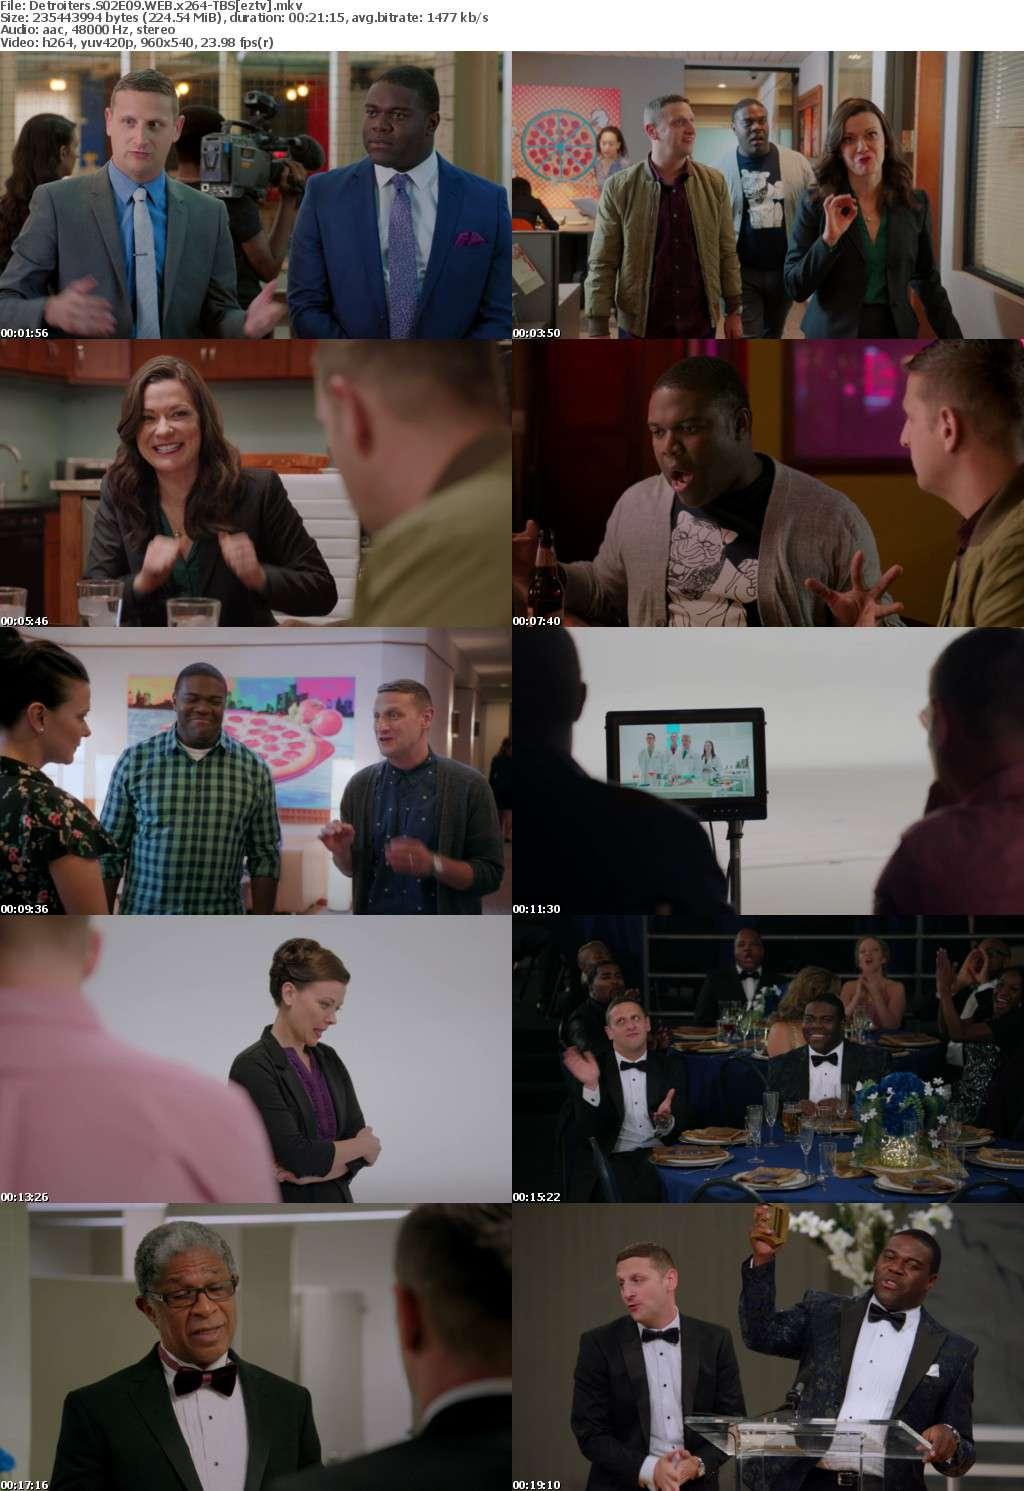 Detroiters S02E09 WEB x264-TBS